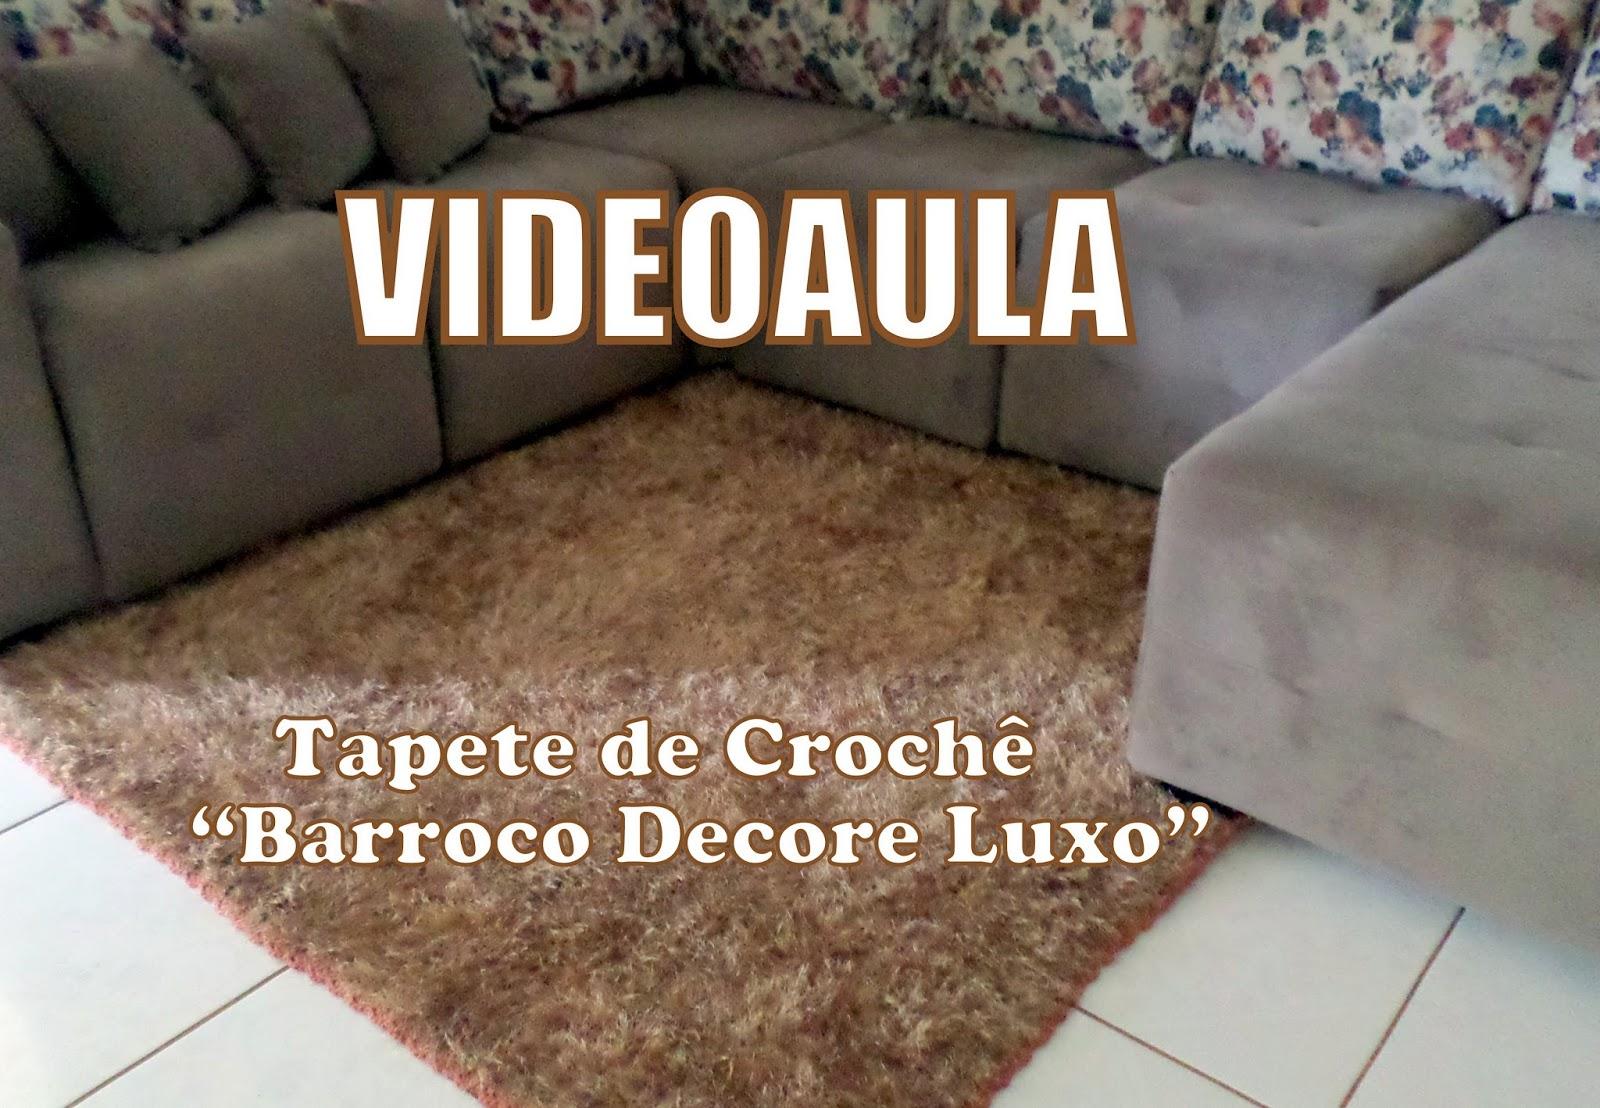 Diandra Arte Em Croch Videoaula Tapete De Sala Decore Luxo